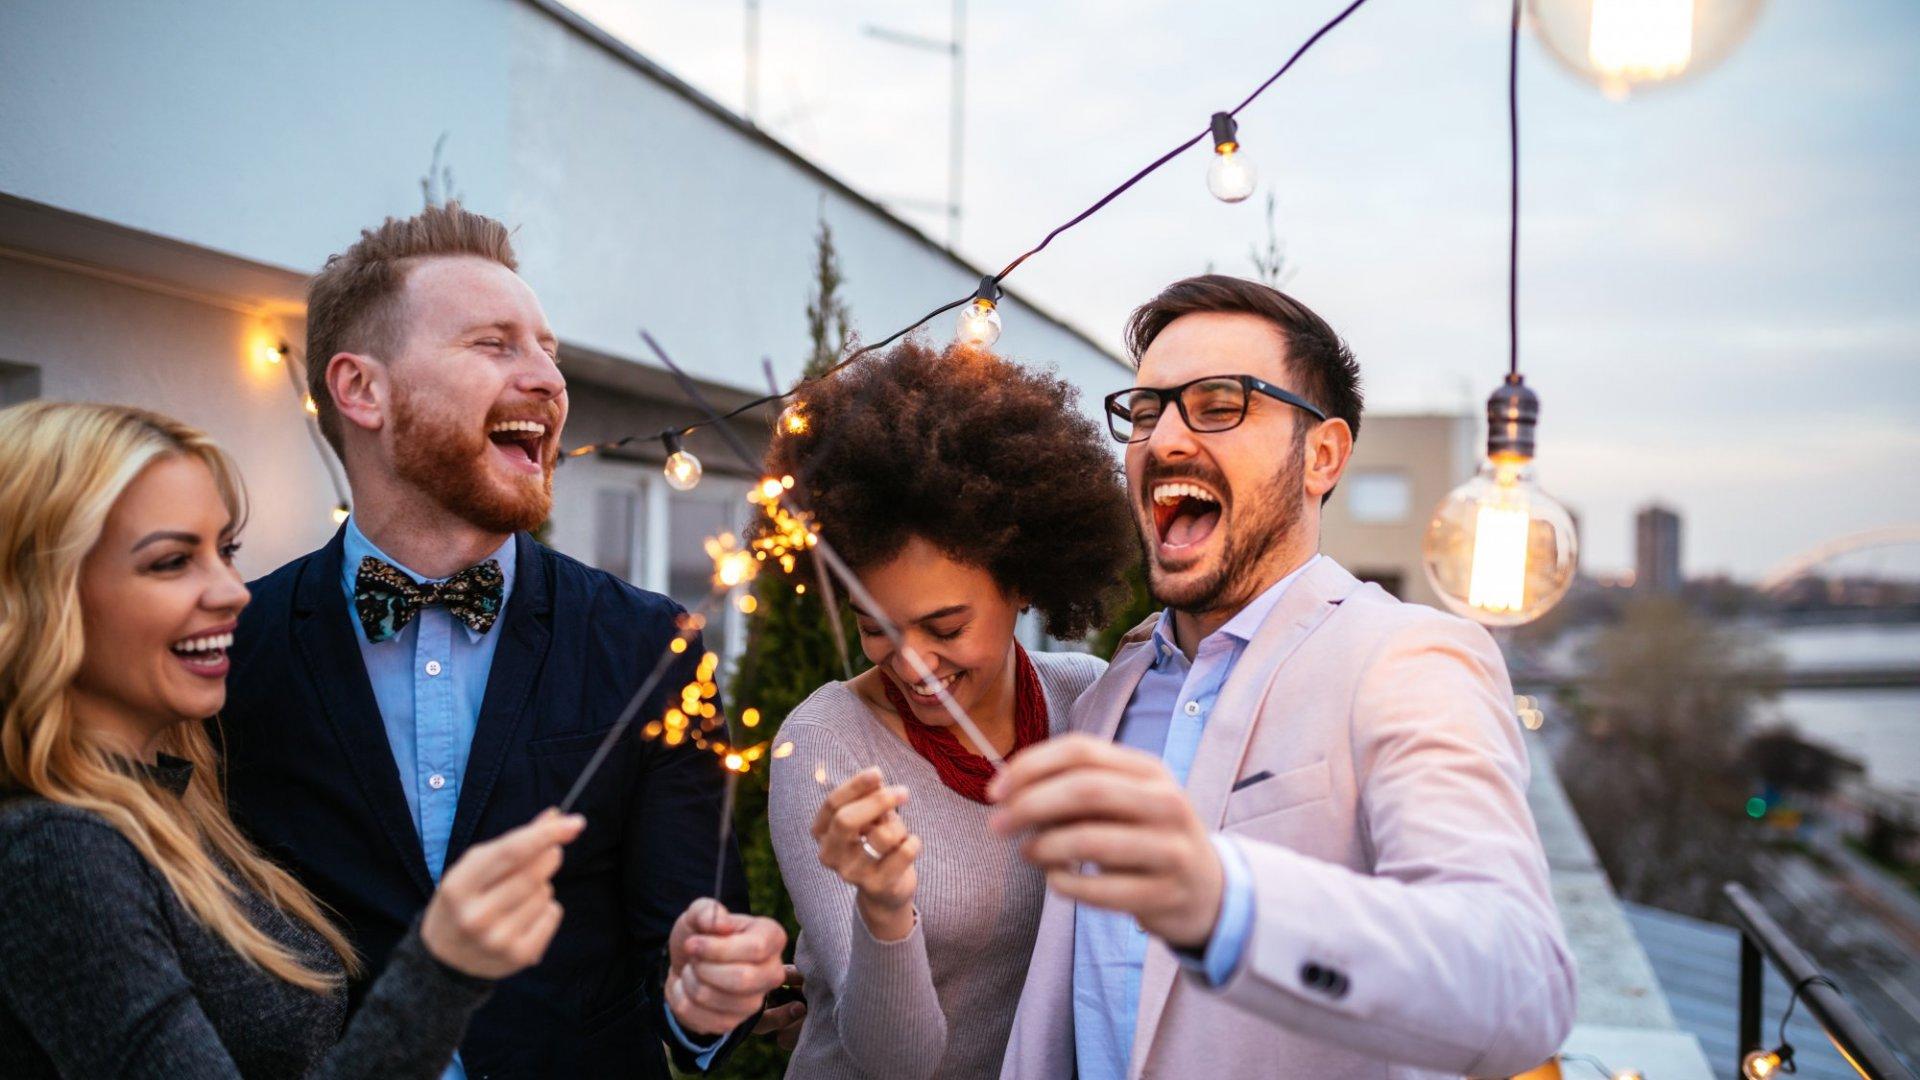 6 Ways to Make Business Travel More Fun